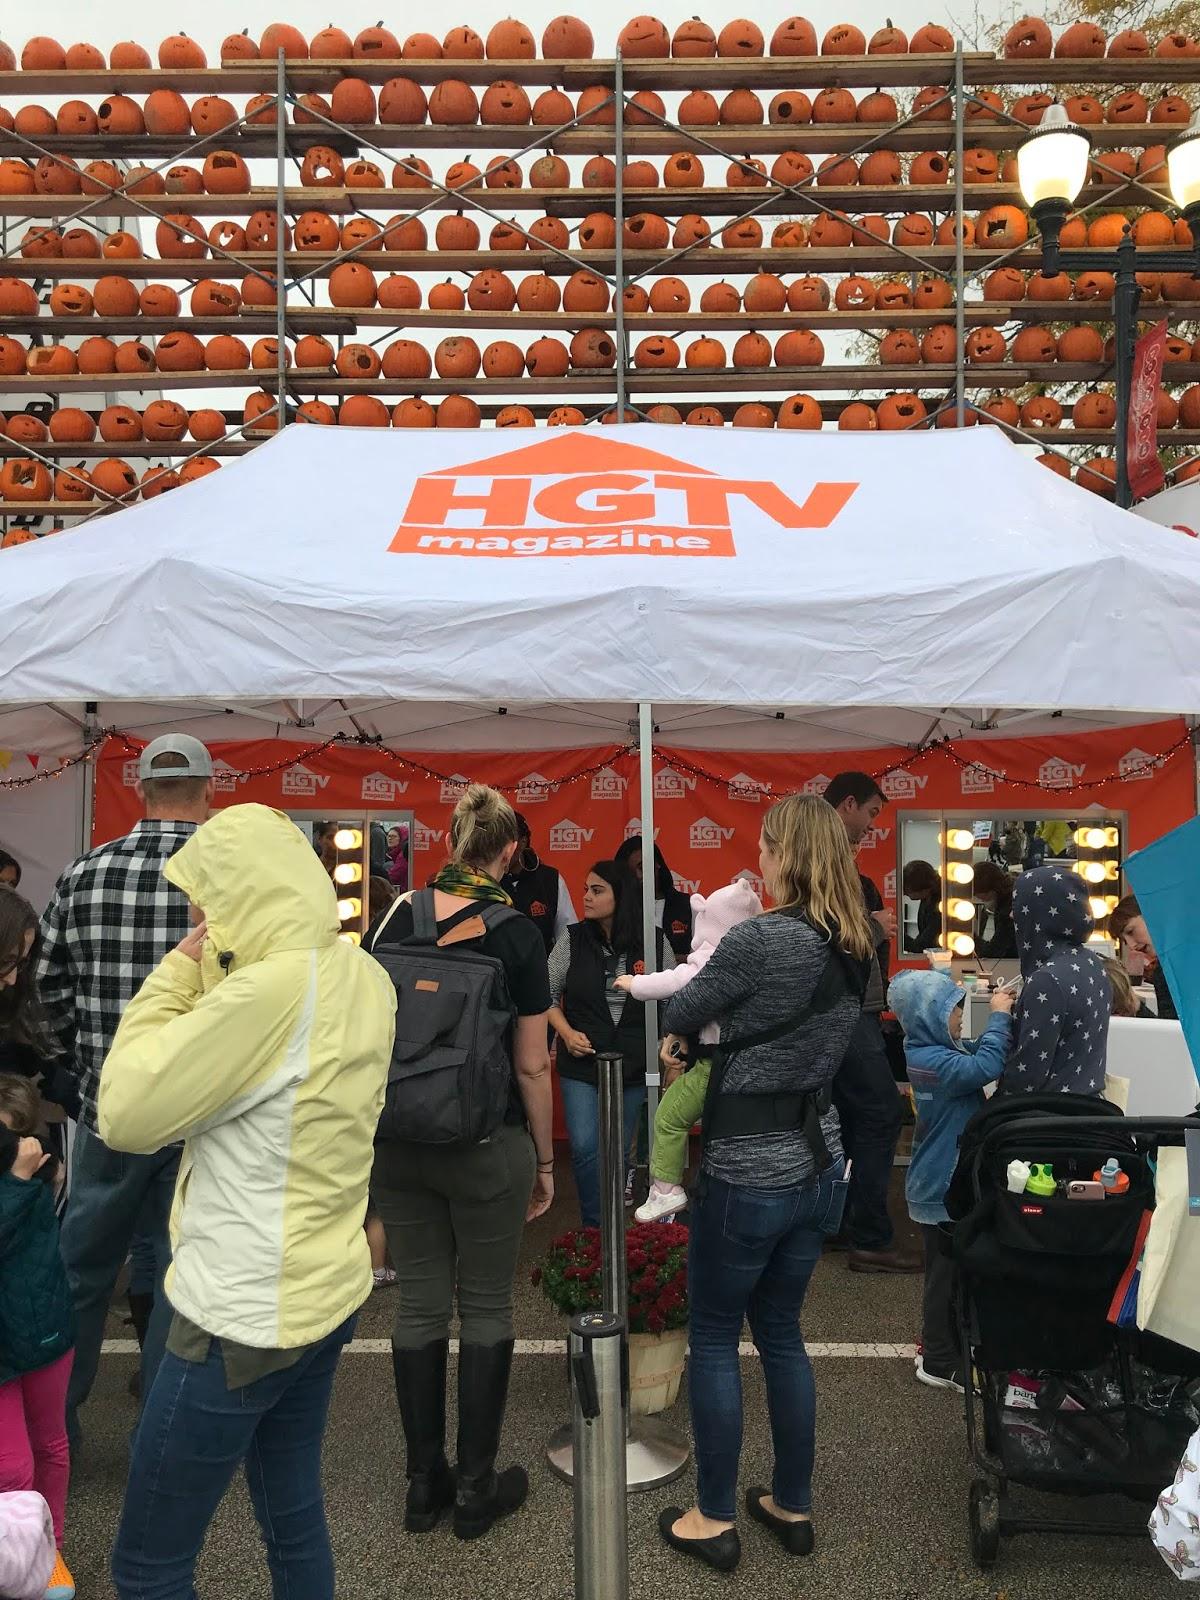 HGTV Highwood Pumpkin Festival